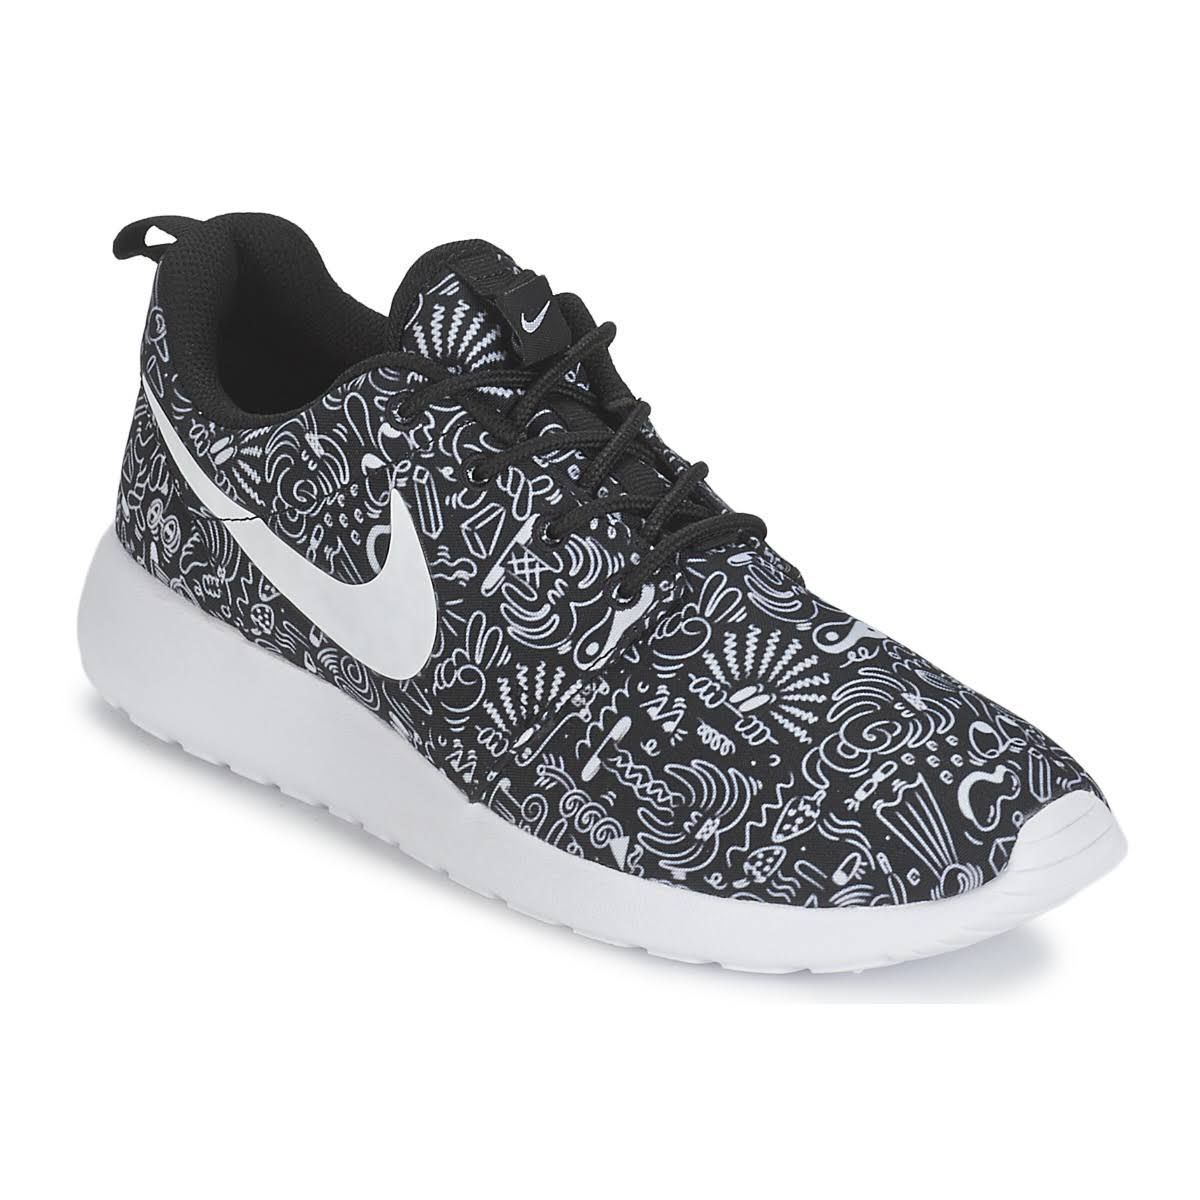 Nike Wmns Nike Roshe One Print Prem Sneakers & Tennis Basses Femme. qqCICx